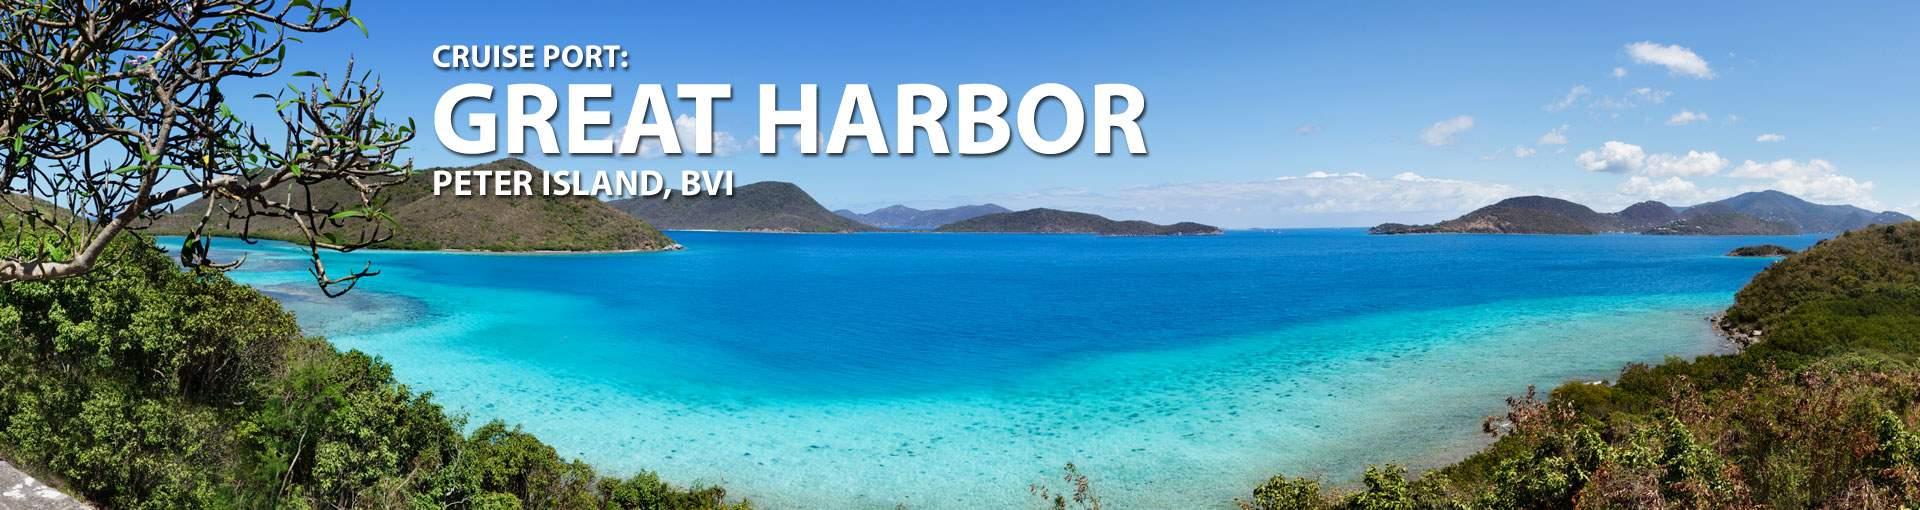 Cruises to Great Harbor, Peter Island, Bvi